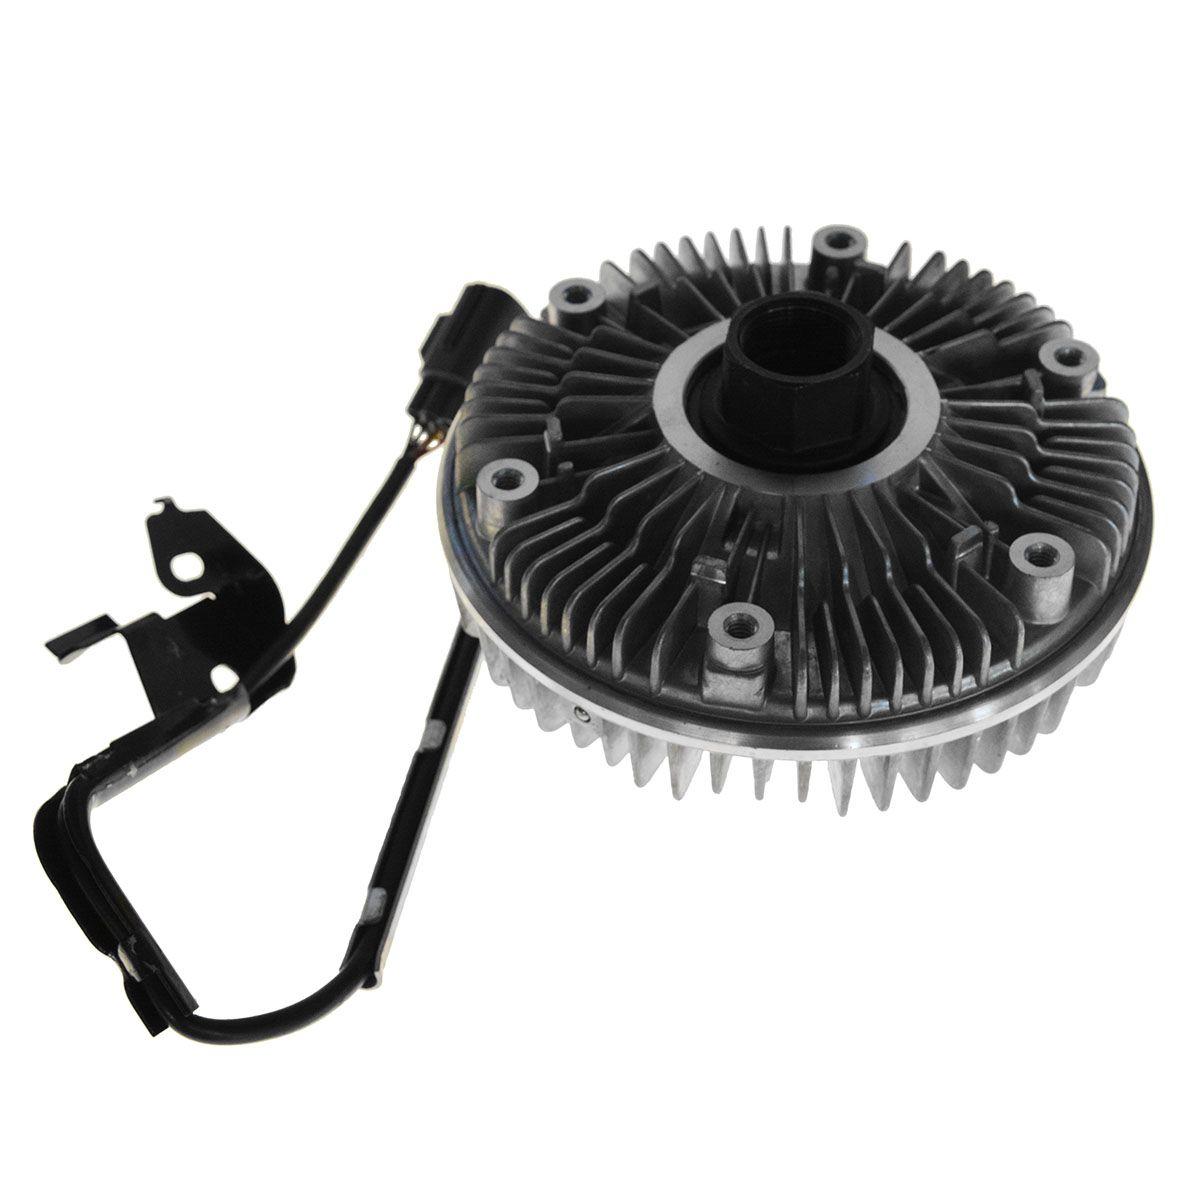 hight resolution of electric radiator cooling fan clutch for 04 09 dodge truck ram cummins diesel